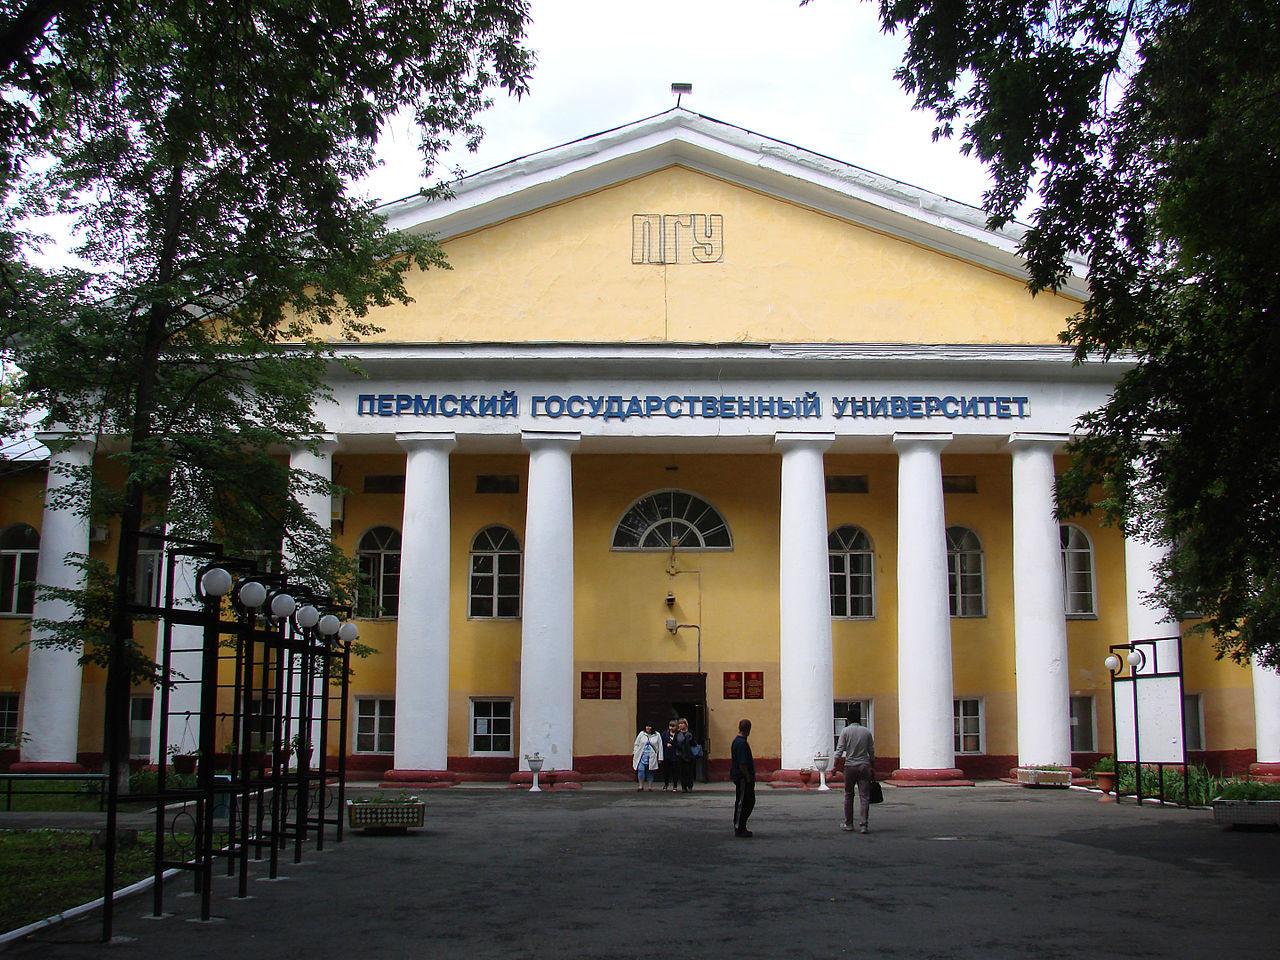 Filološka fakulteta Univerze v Permu